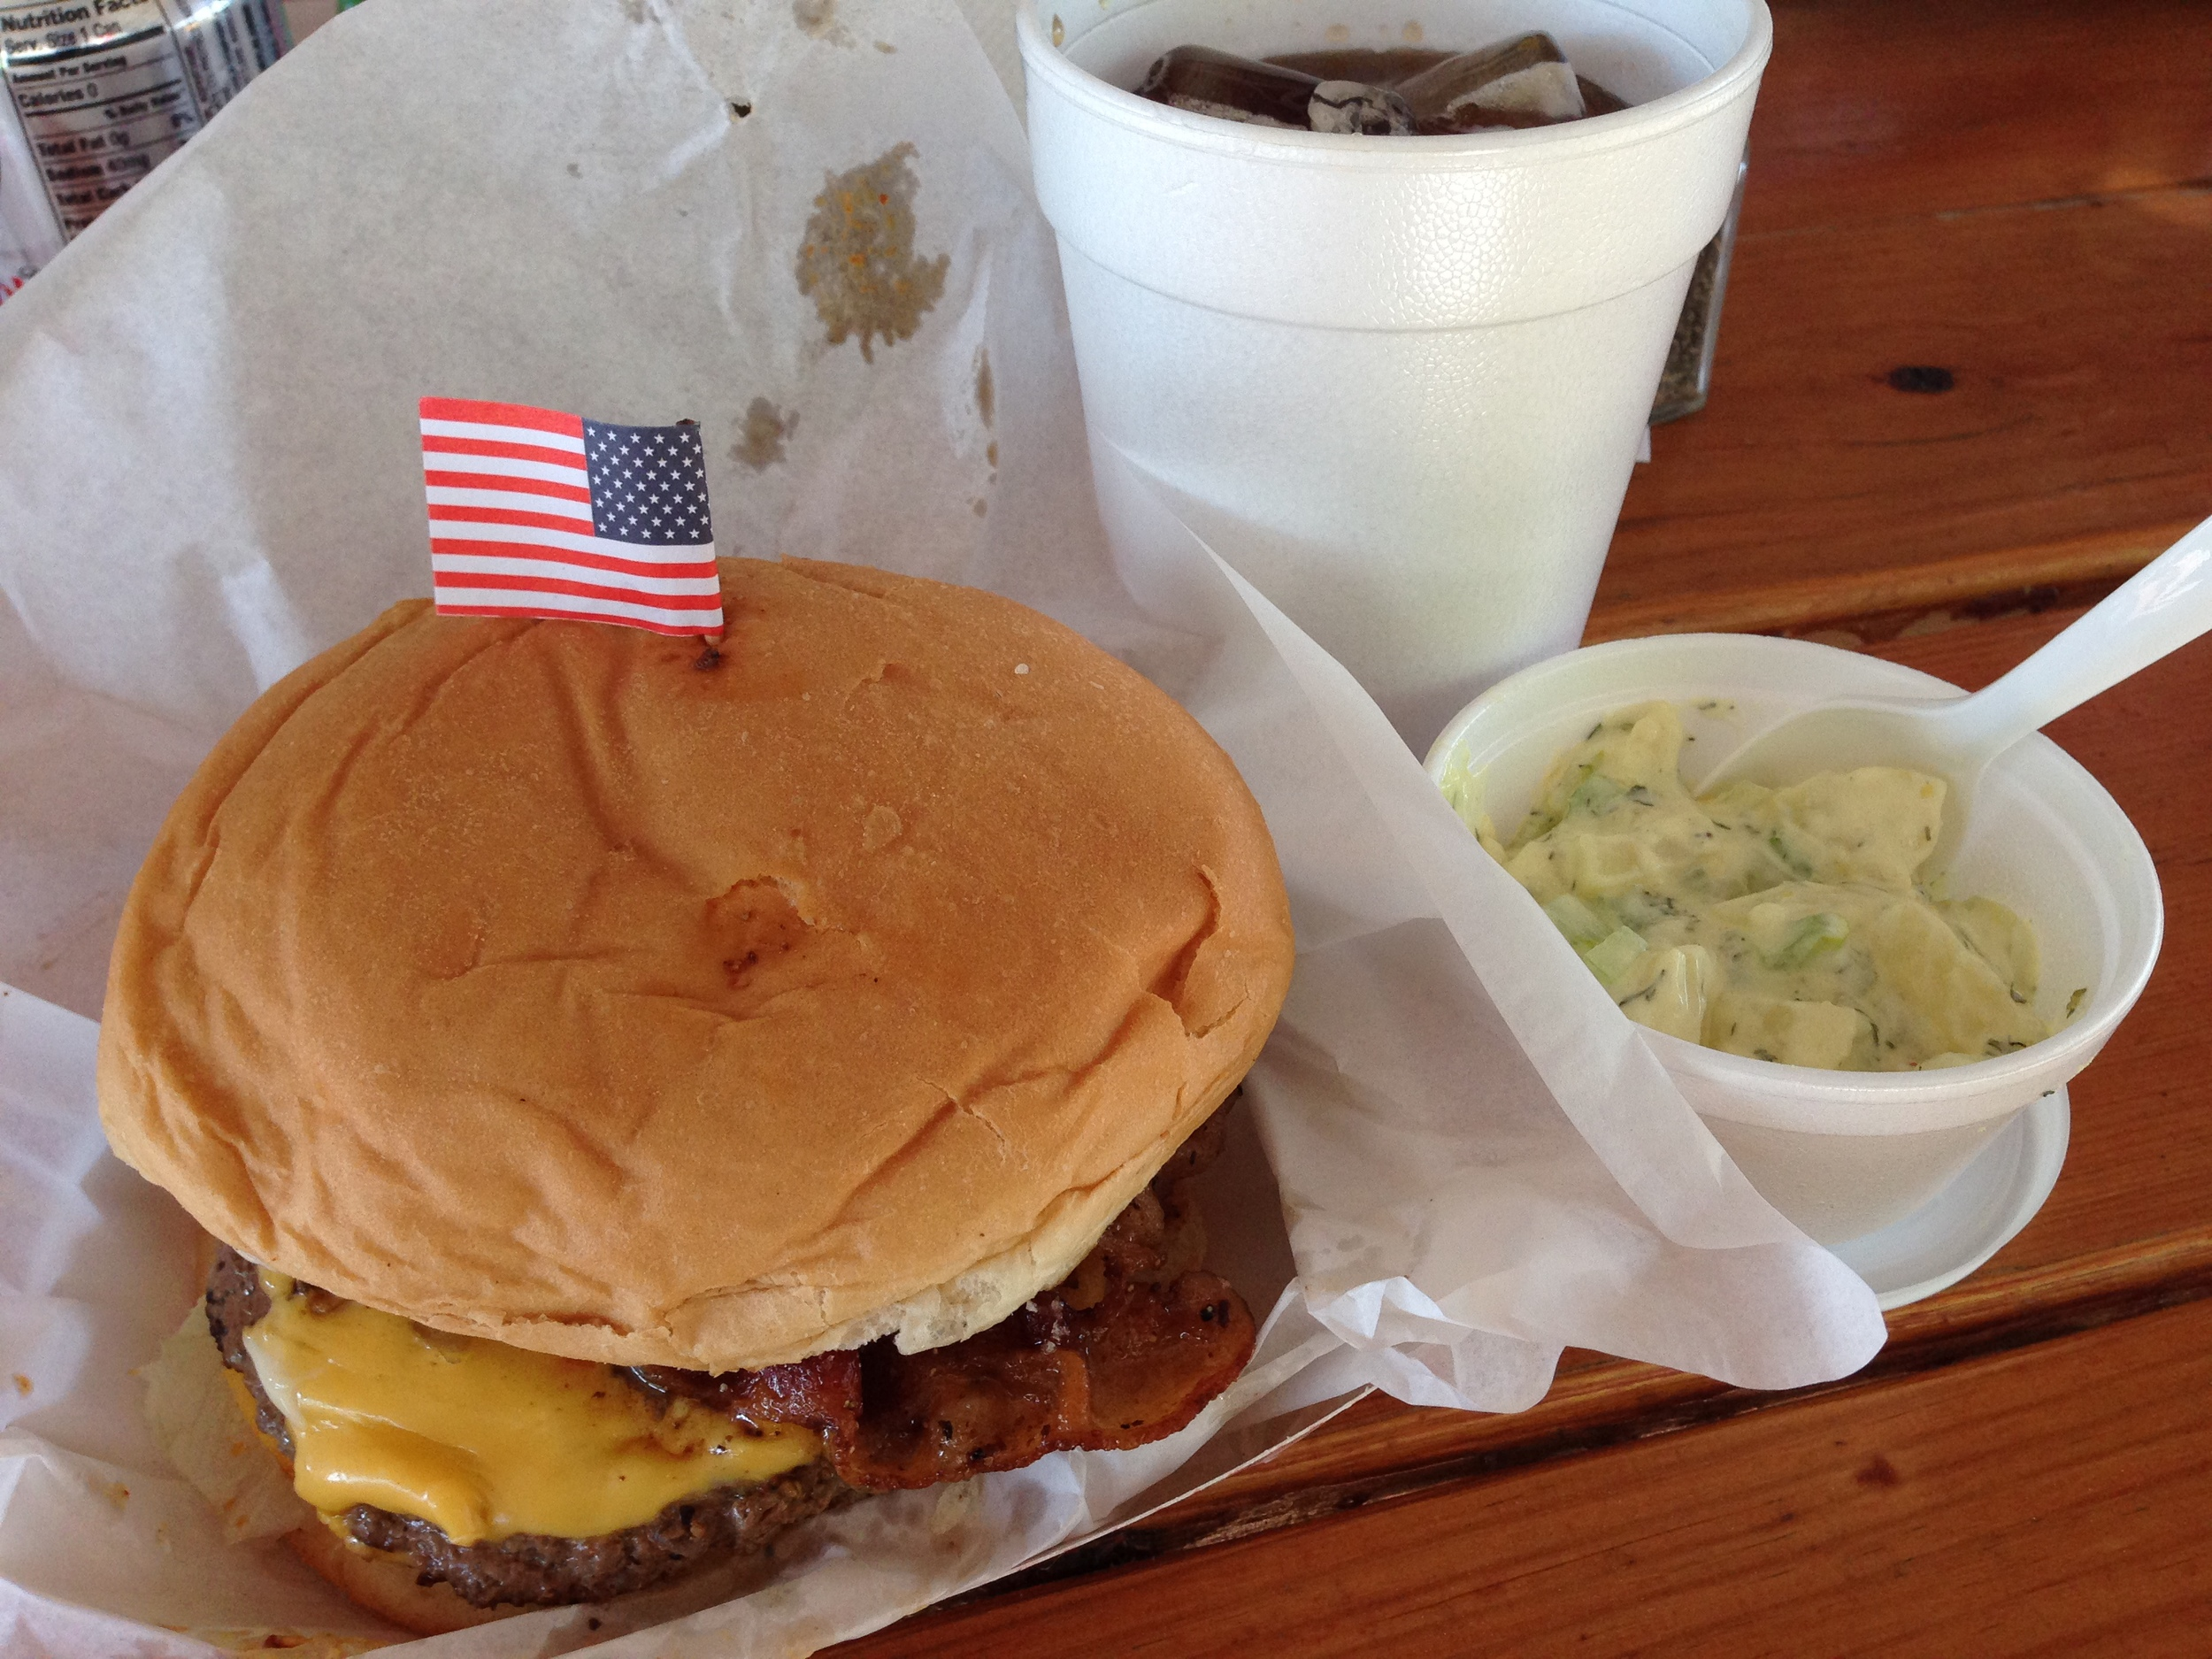 The buffalo bacon cheeseburger, with a side of jalapeño potato salad.